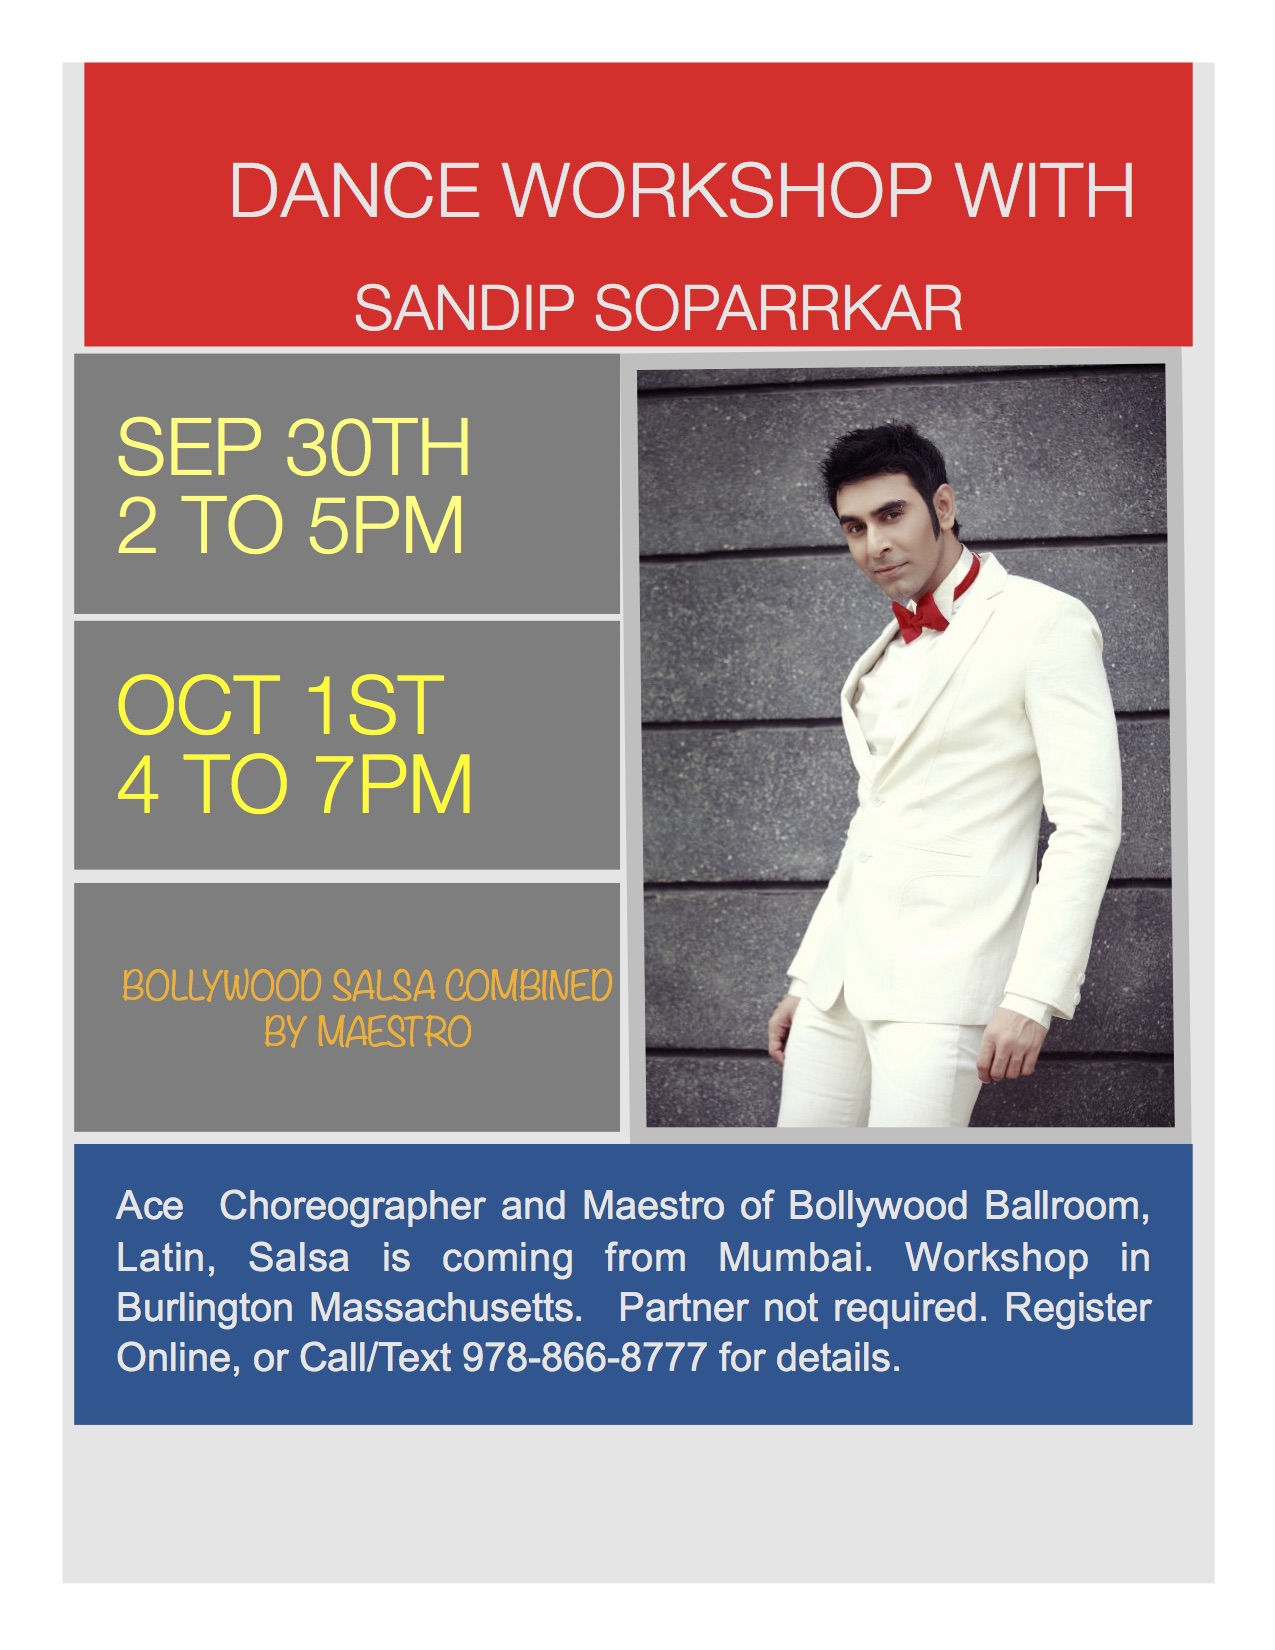 bollywood salsa dance workshop